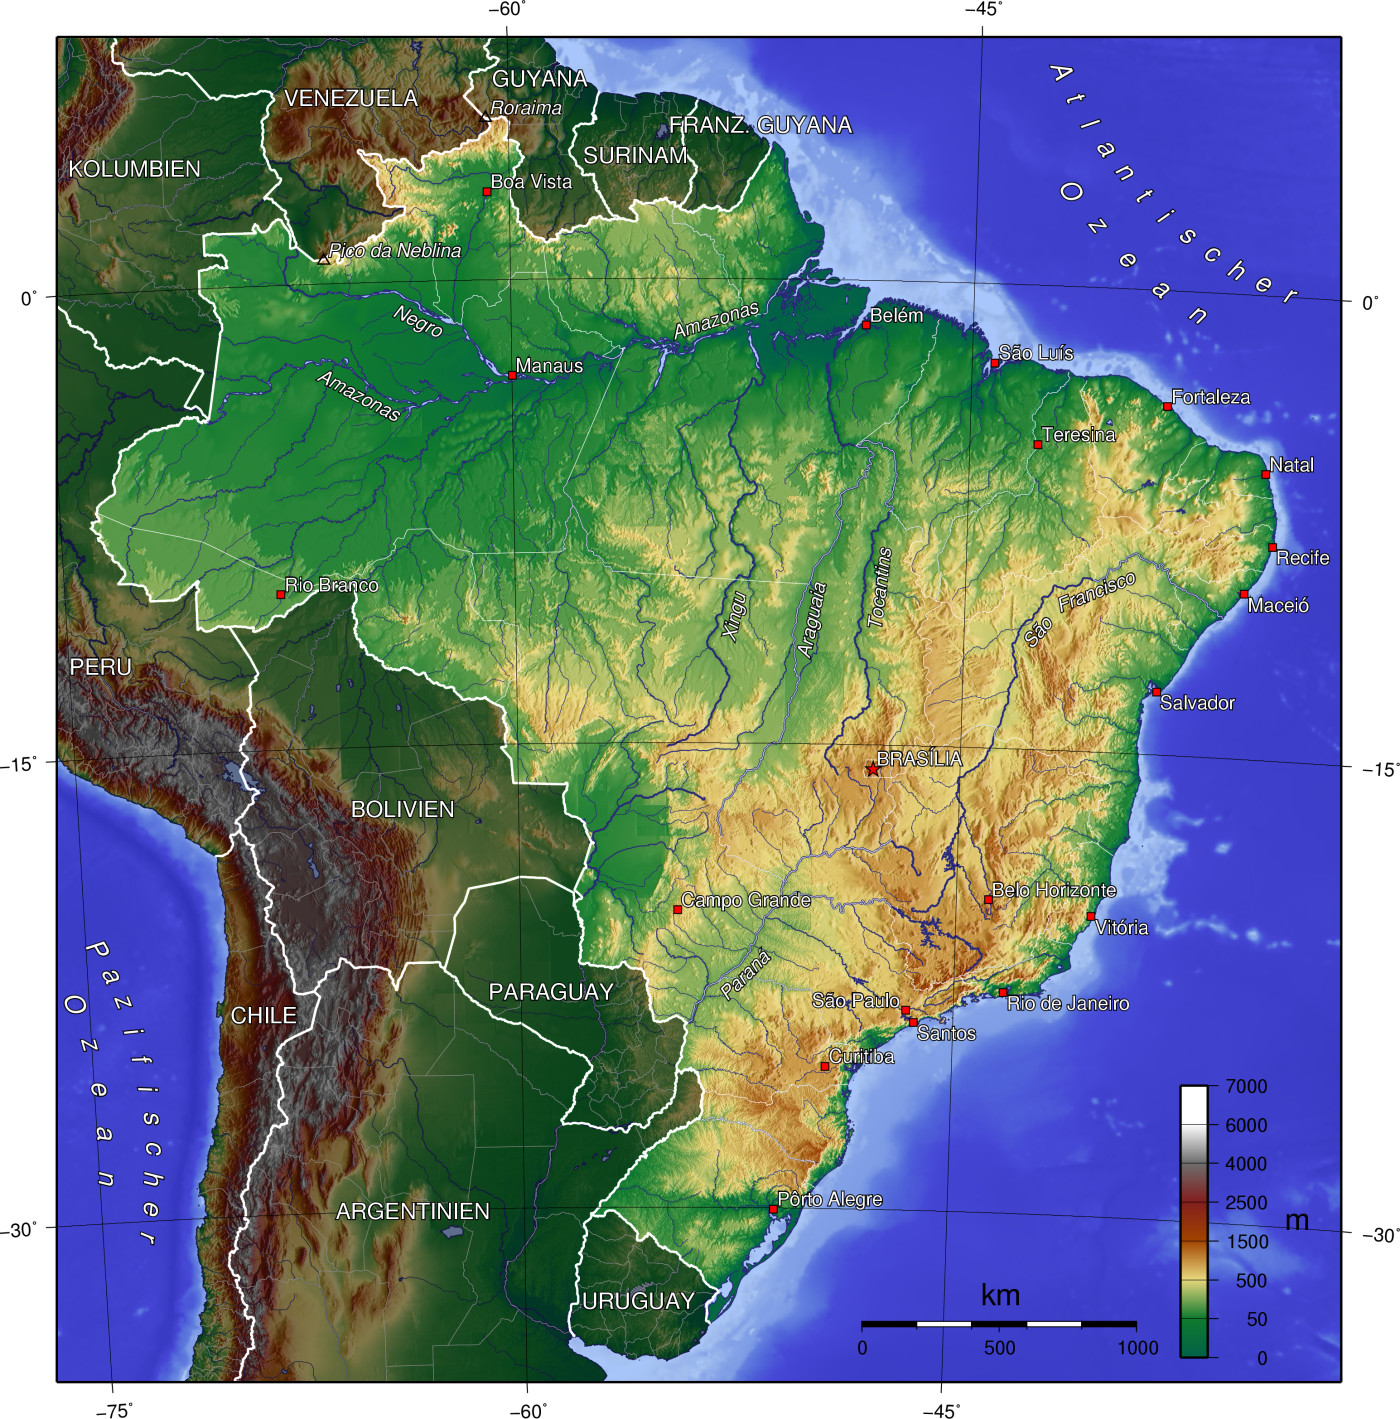 physische karte brasilien Landkarte Brasilien (Topographische Karte) : Weltkarte.